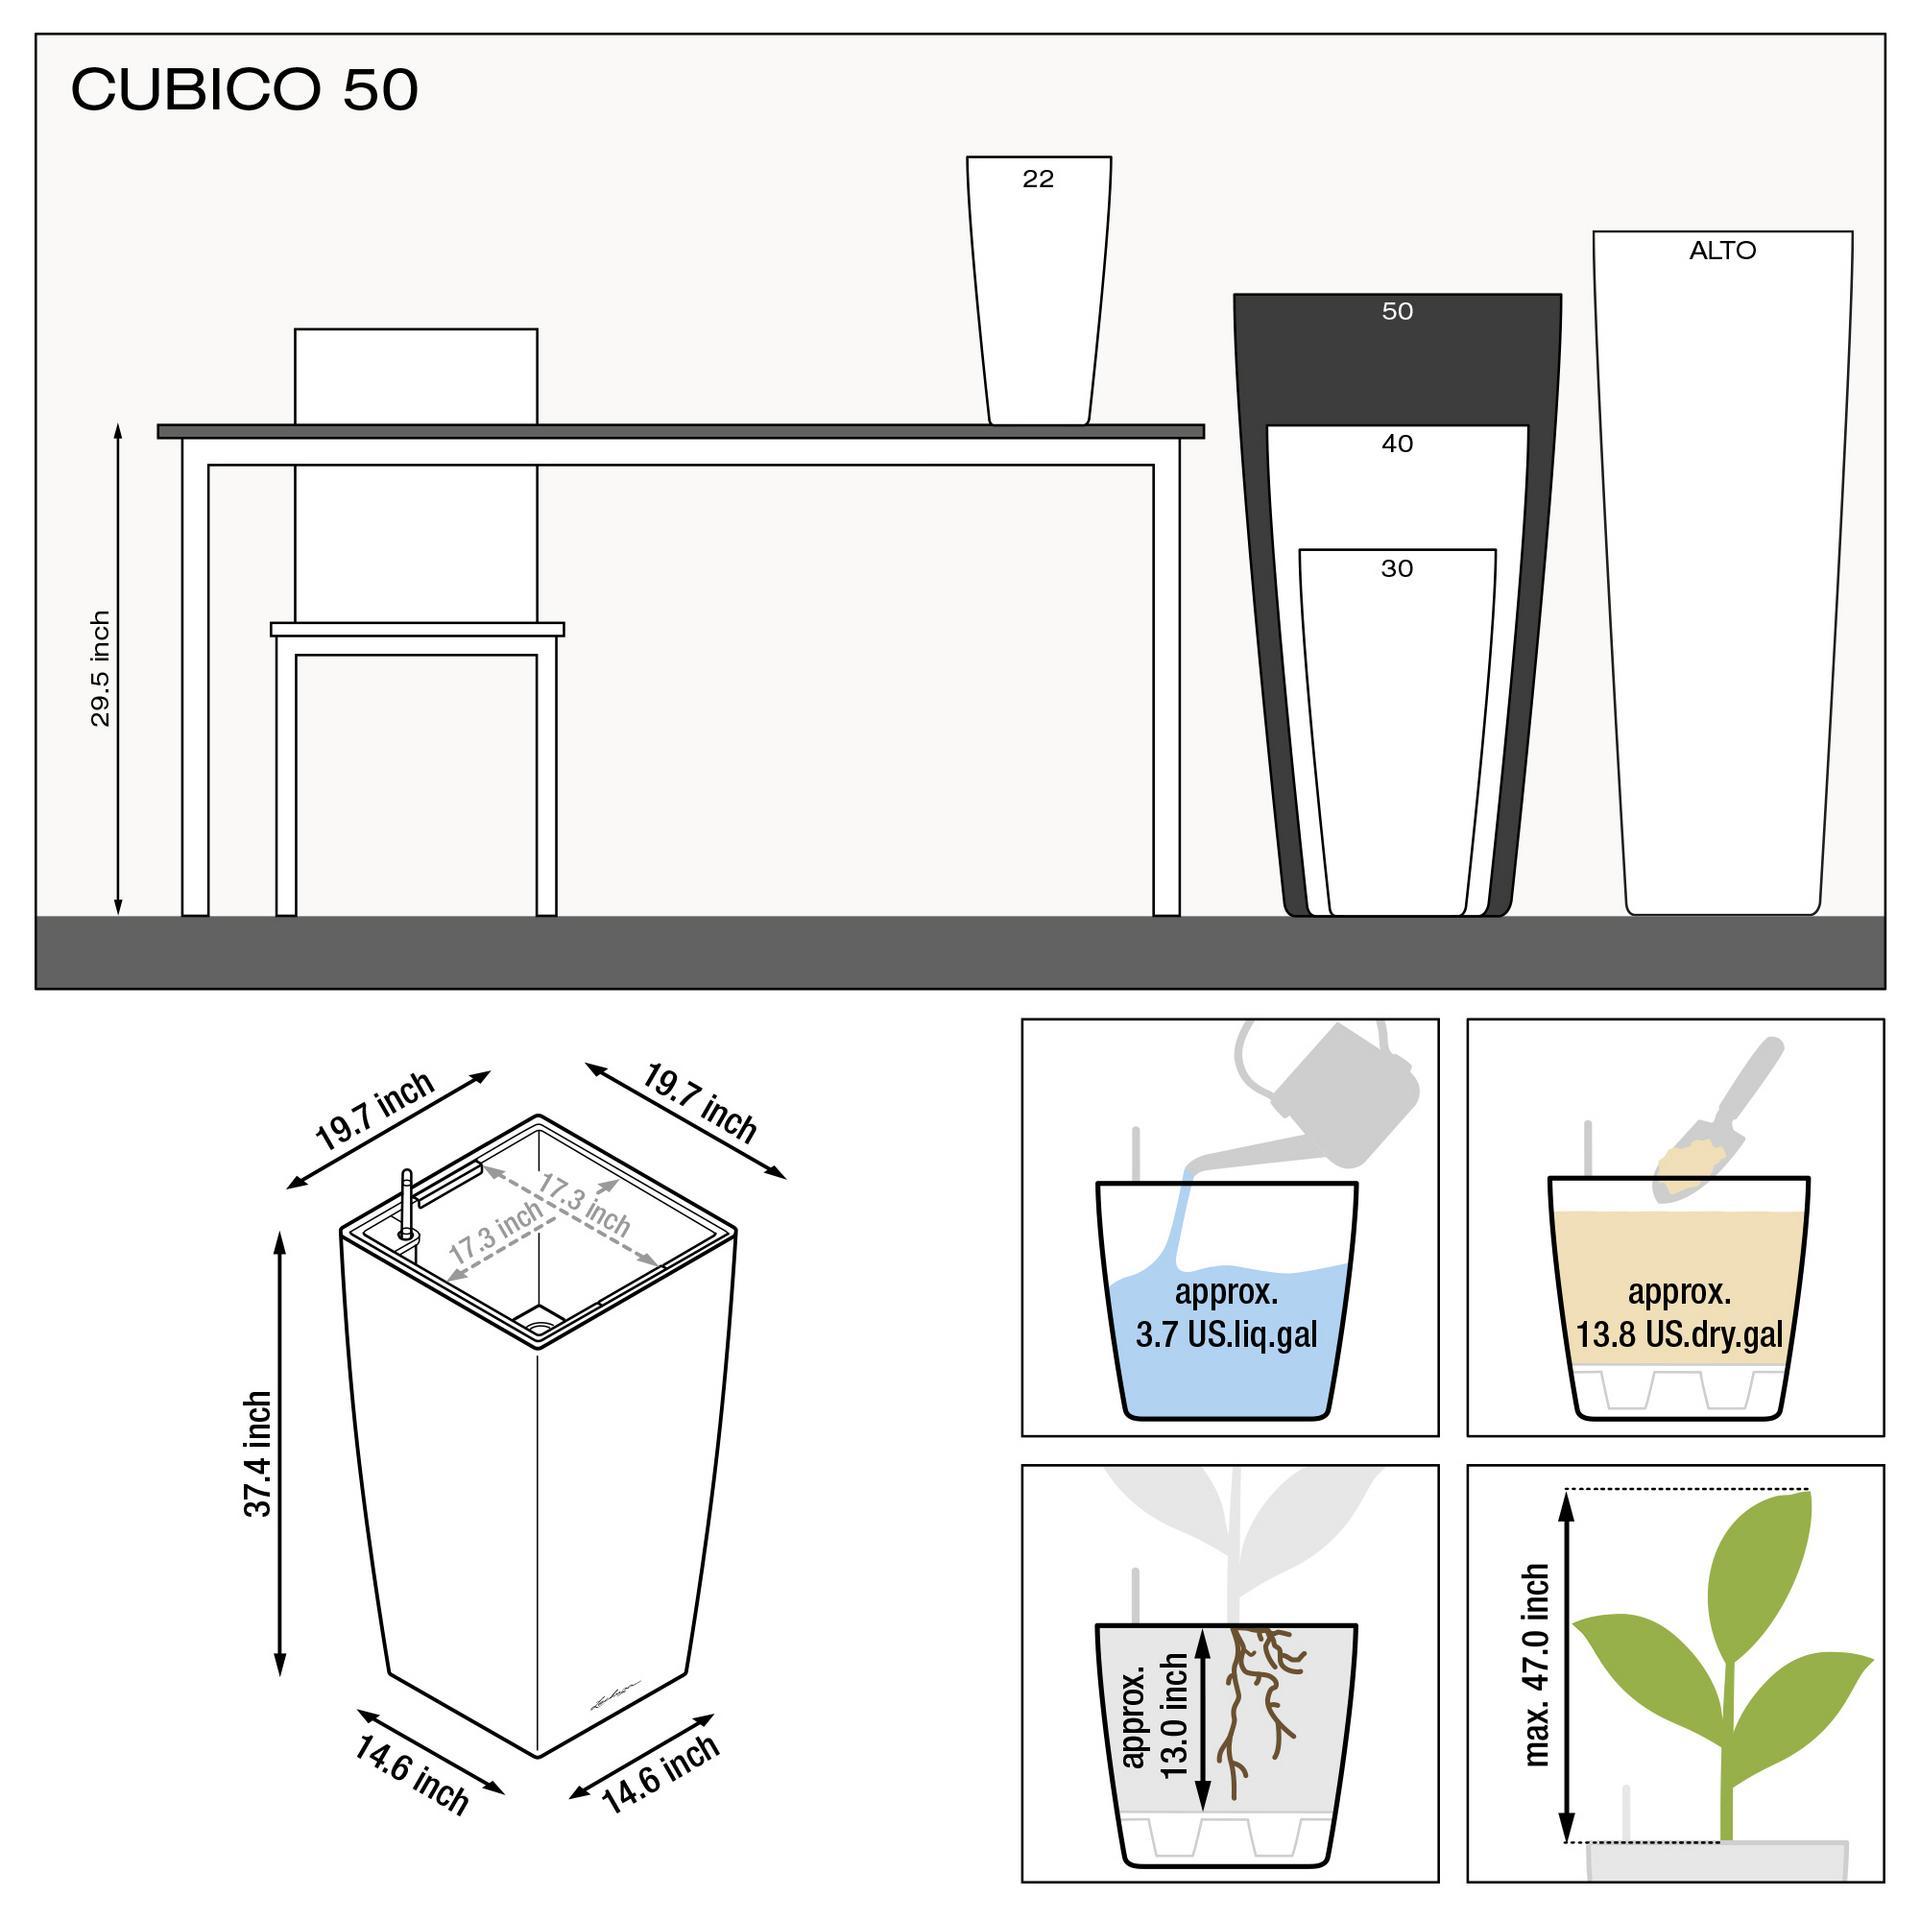 le_cubico50_product_addi_nz_us